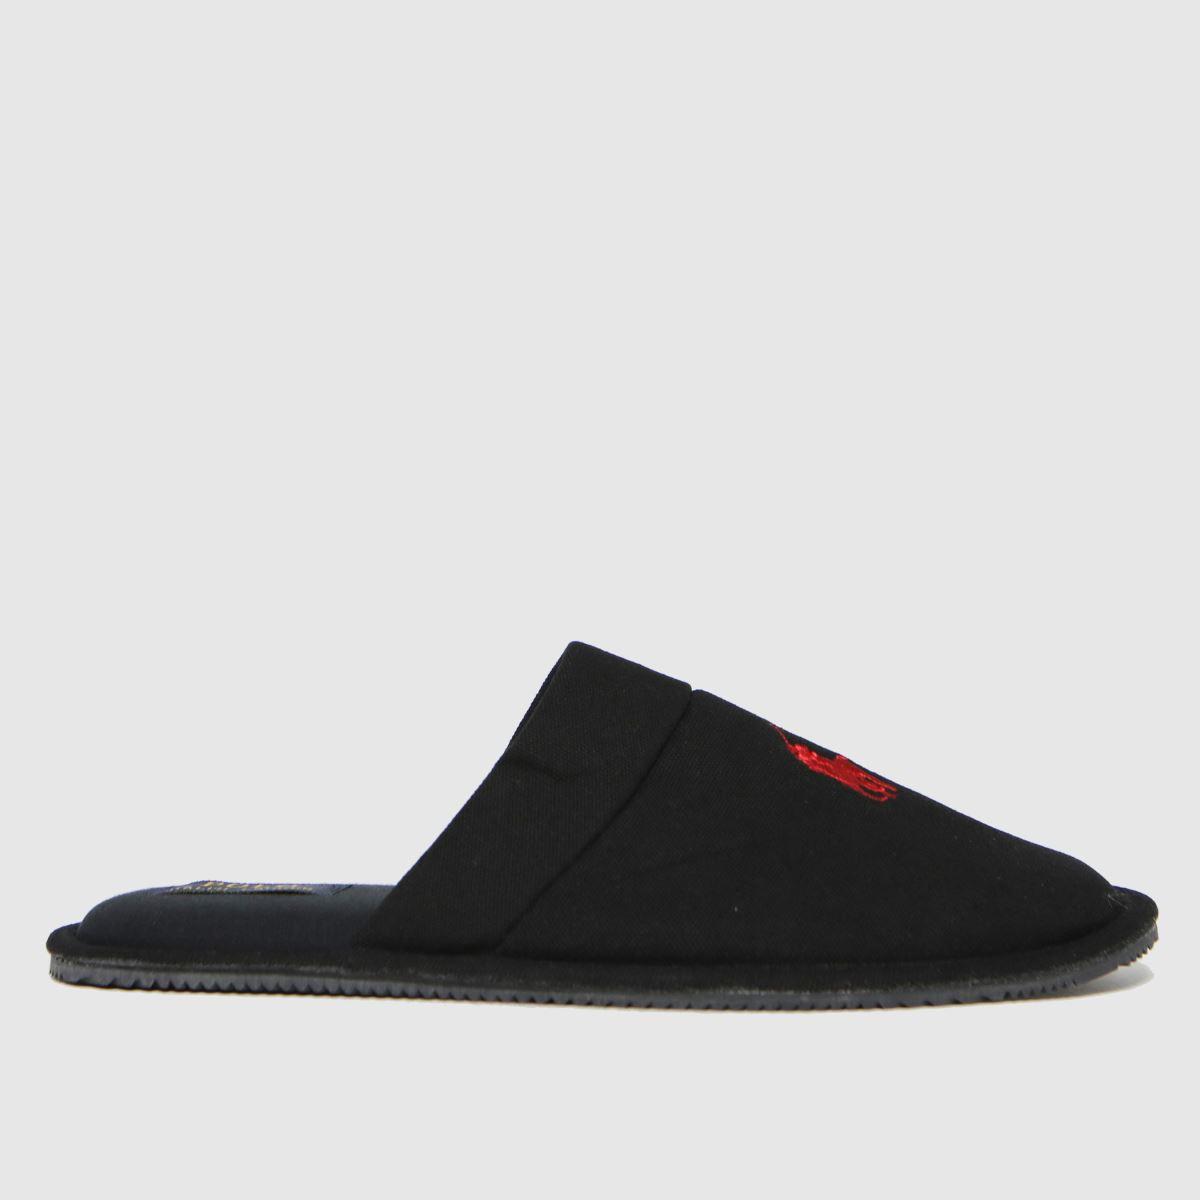 Polo Ralph Lauren Black & Red Klarence Slippers